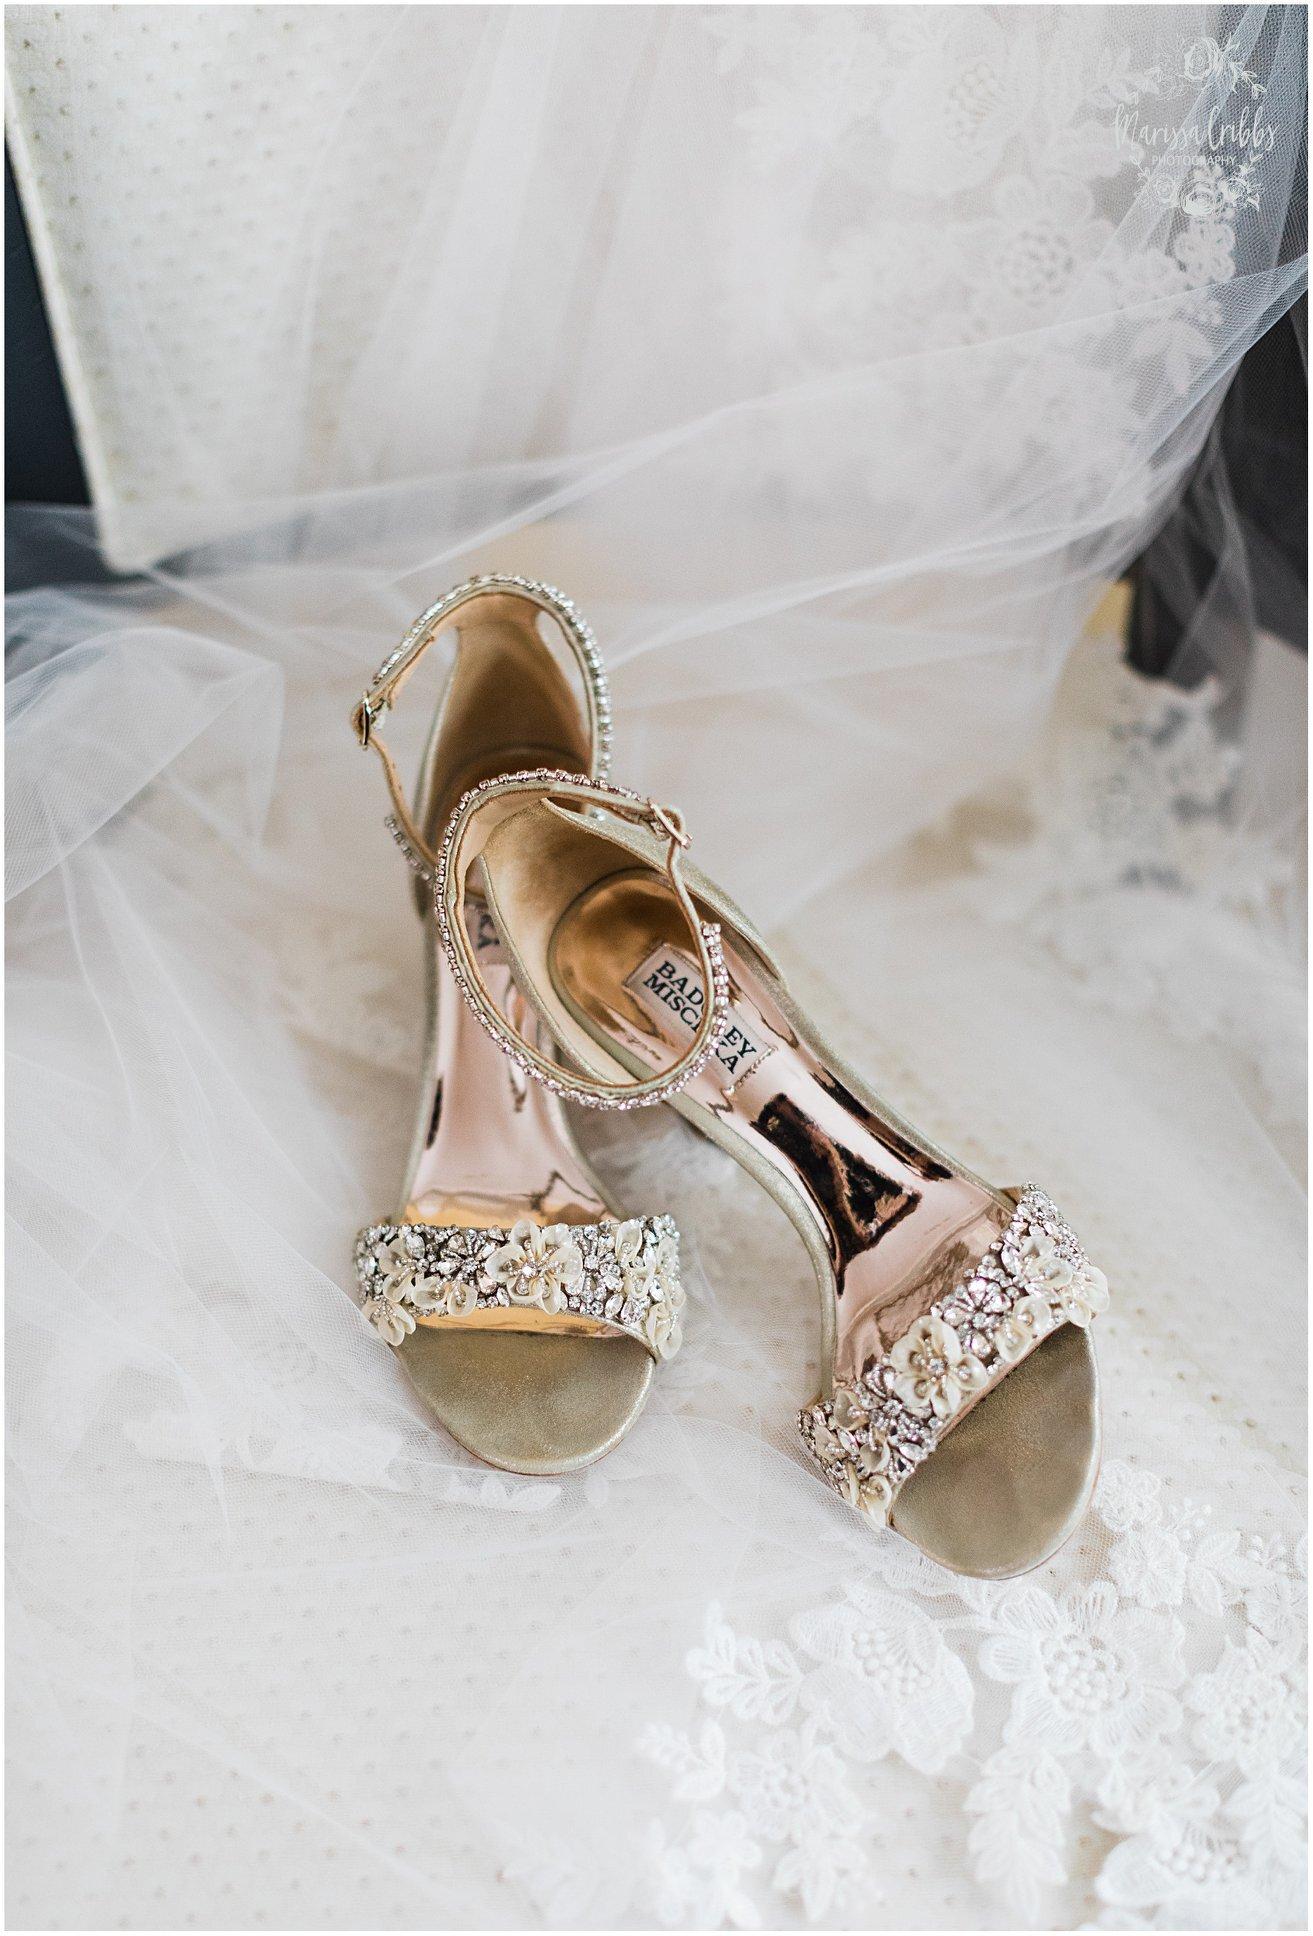 Badgley Mischka Bridal Shoes - Marrisa Cribbs Photography